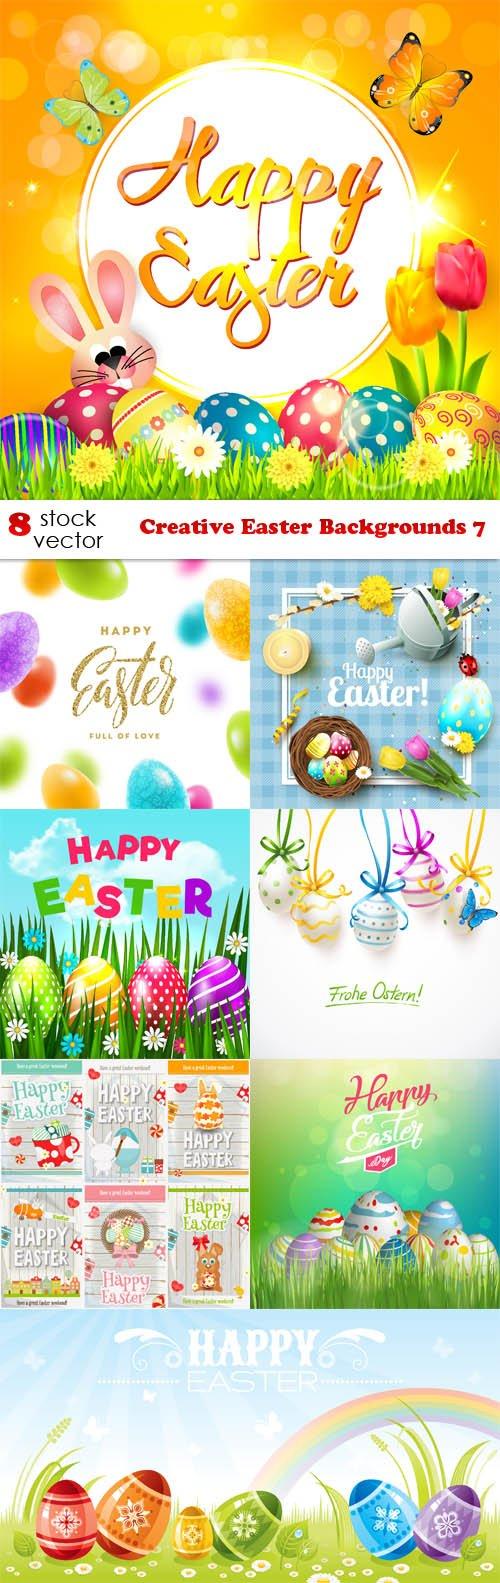 Vectors - Creative Easter Backgrounds 7